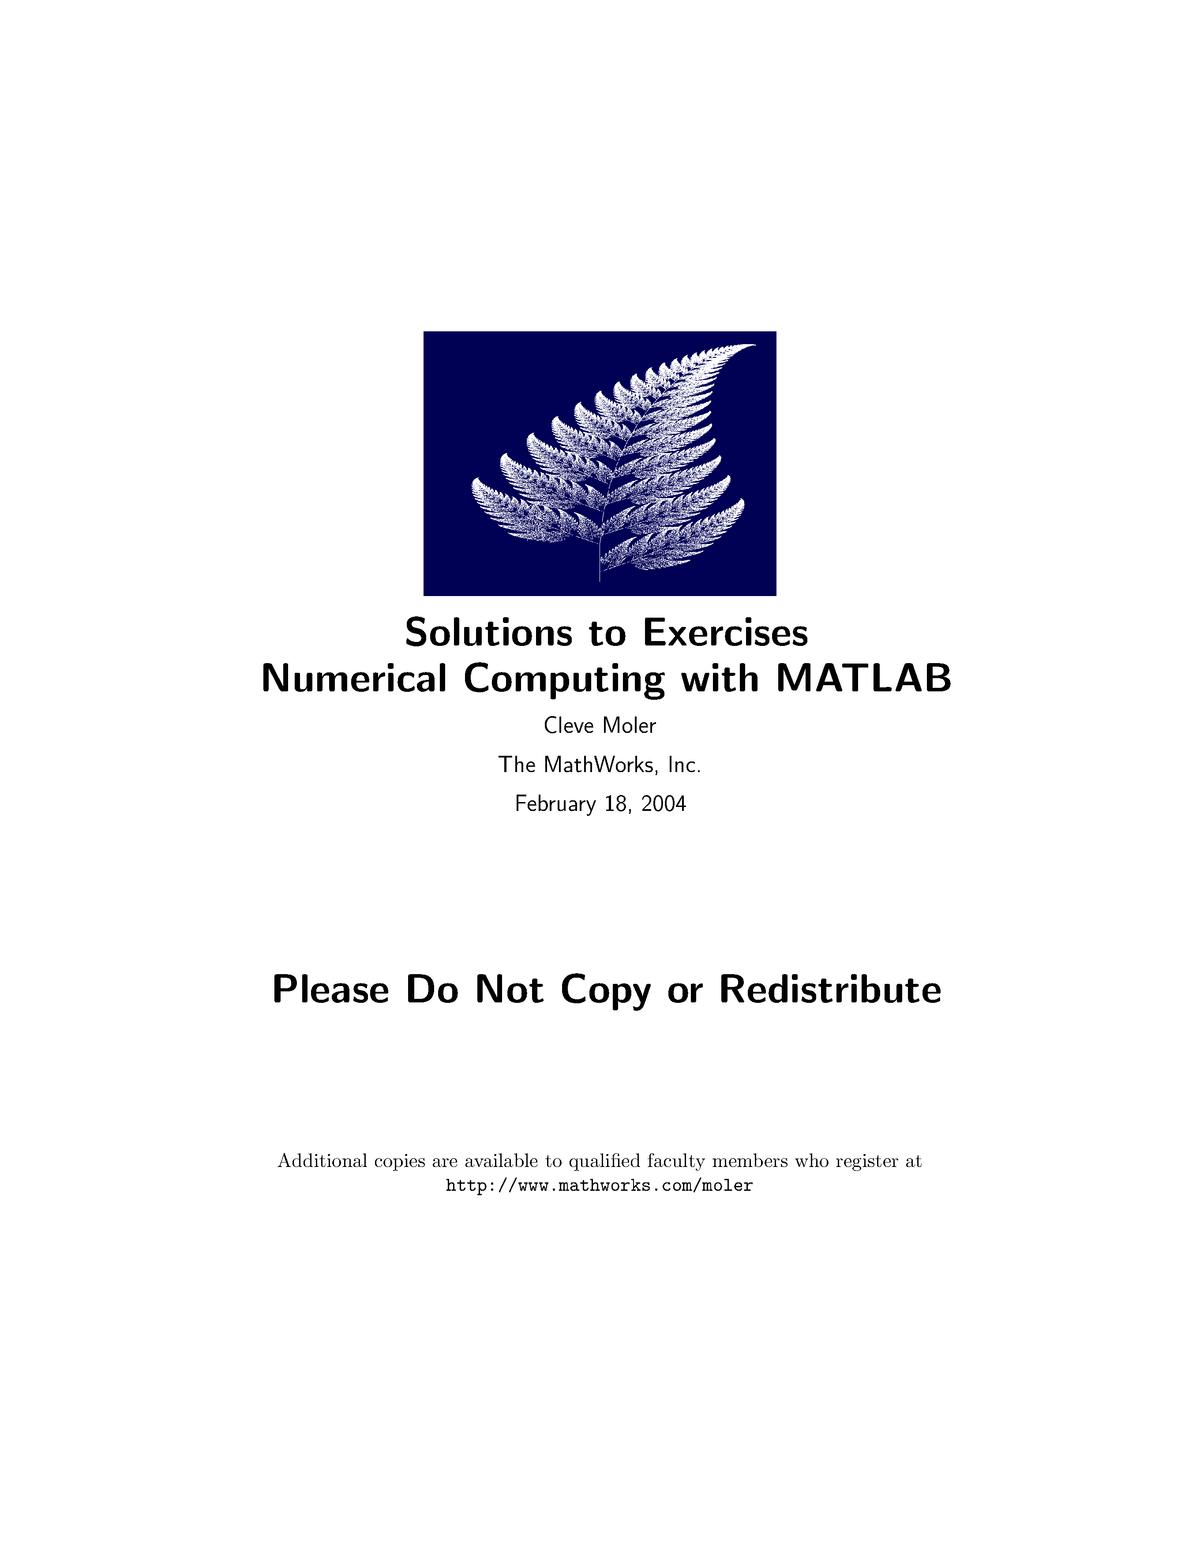 Matlab in Engineering Mechanics - Solution Manual